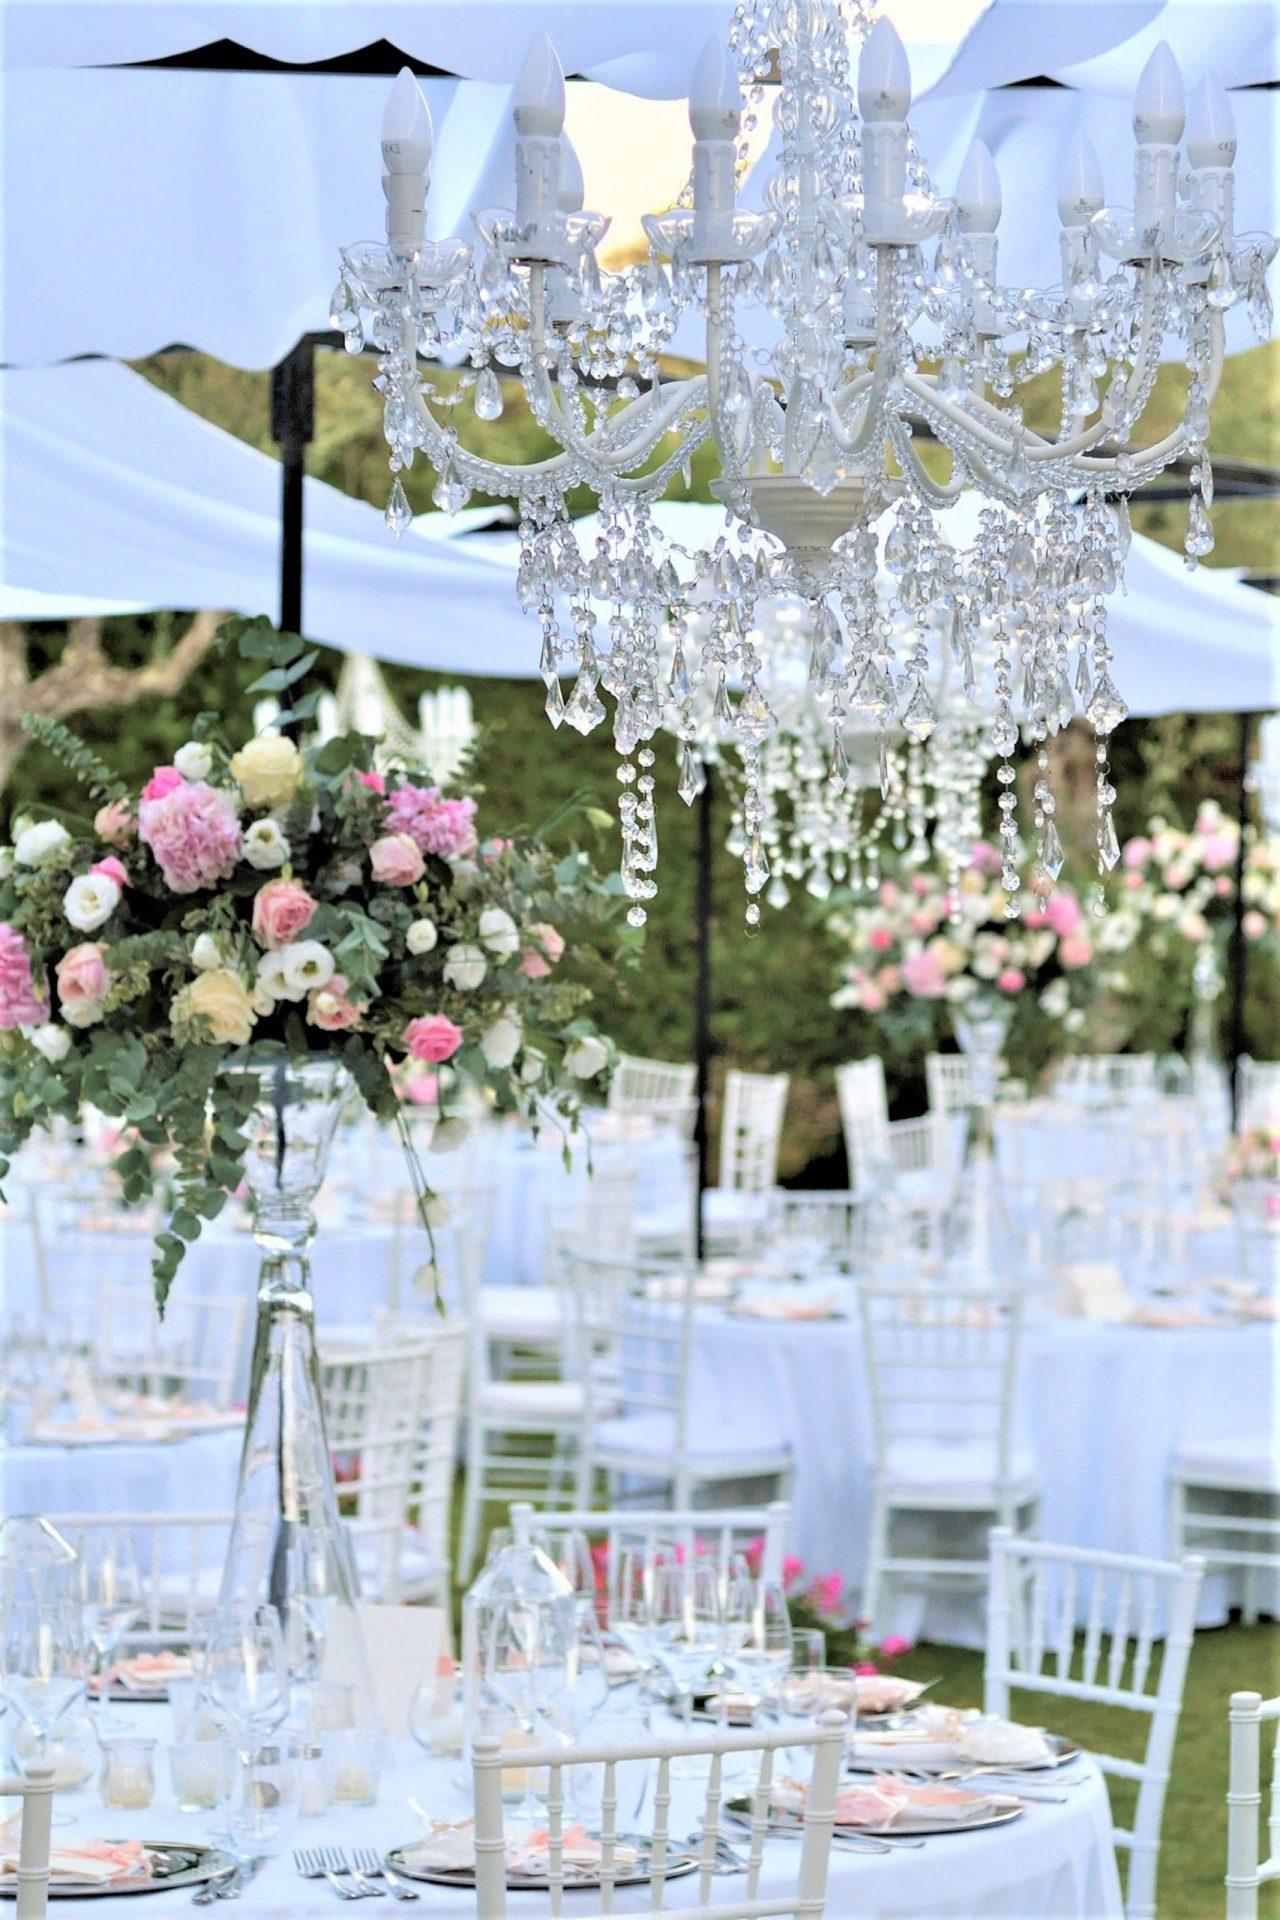 Francesca and Francesco, romantic wedding reception